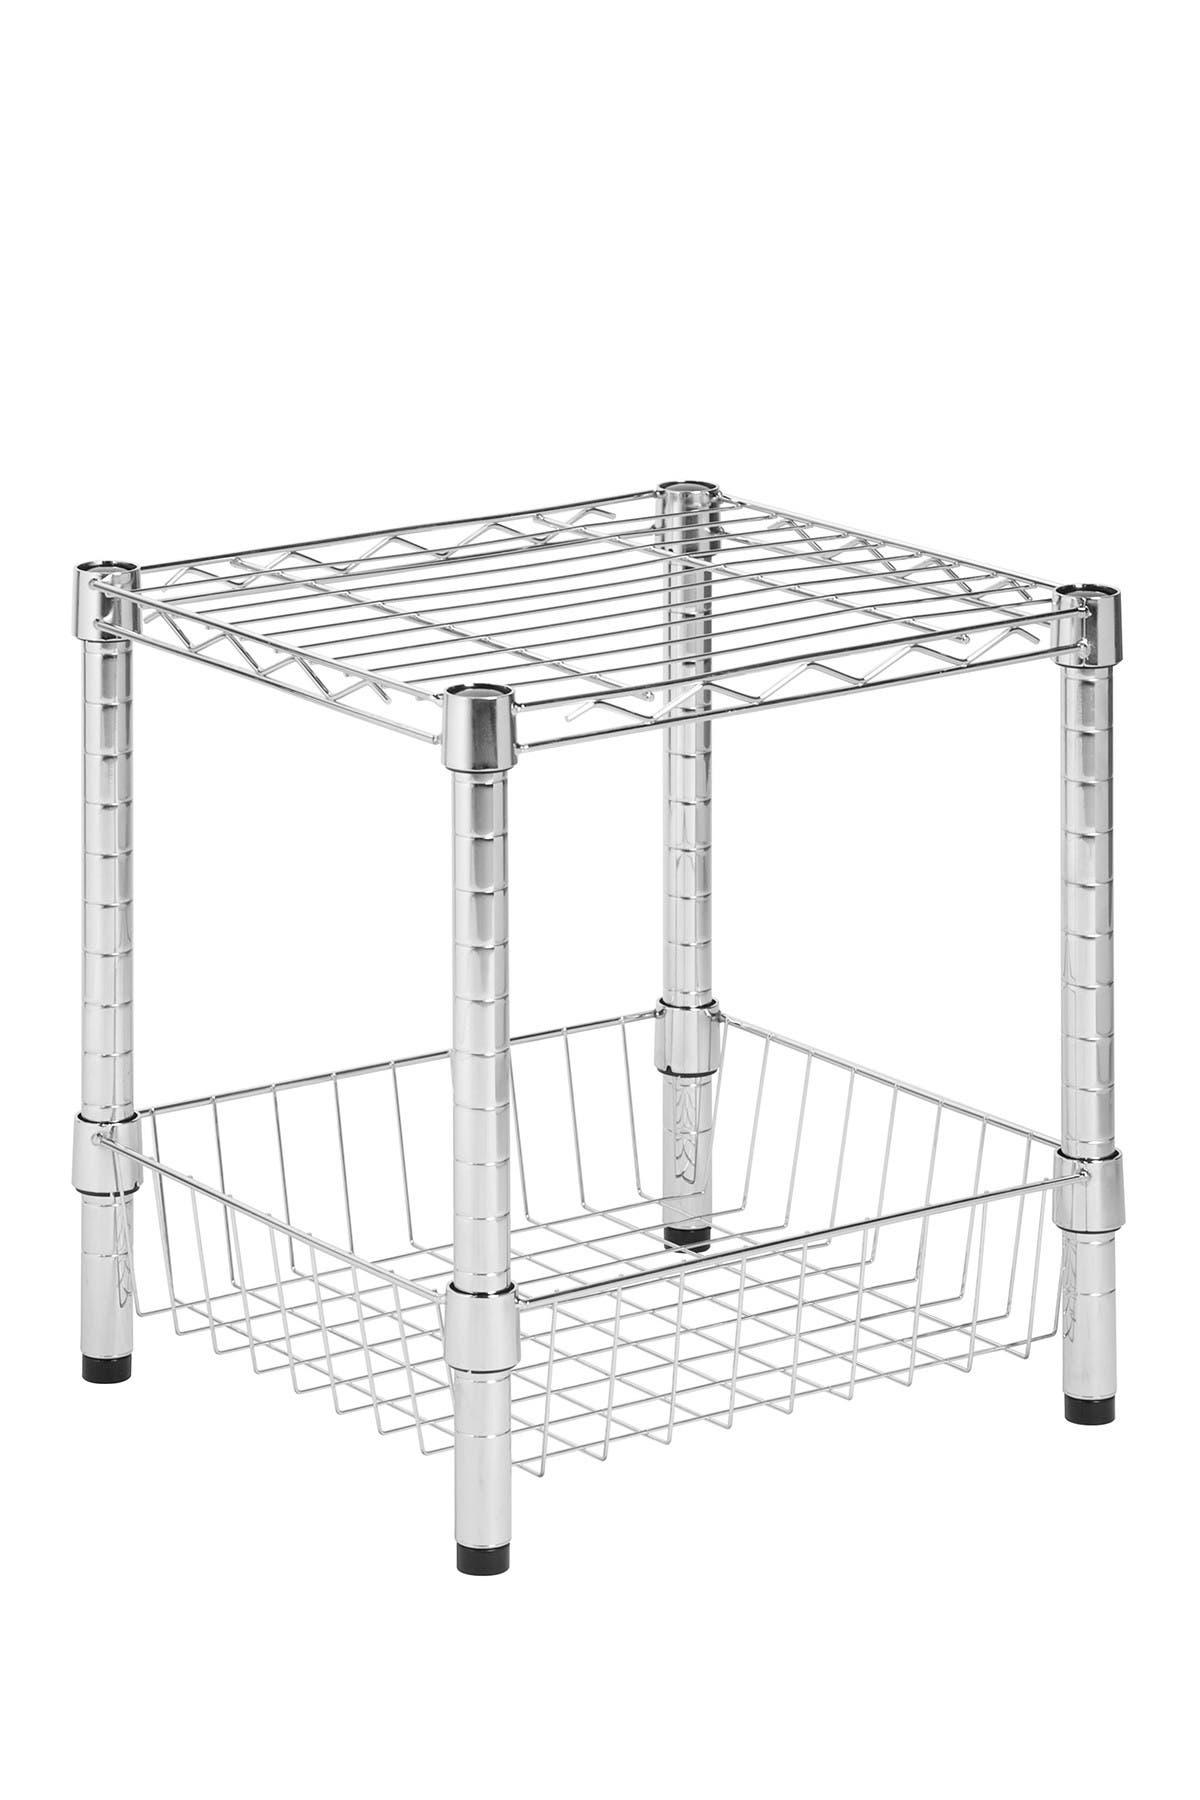 Image of Honey-Can-Do Chrome Urban Basket Table